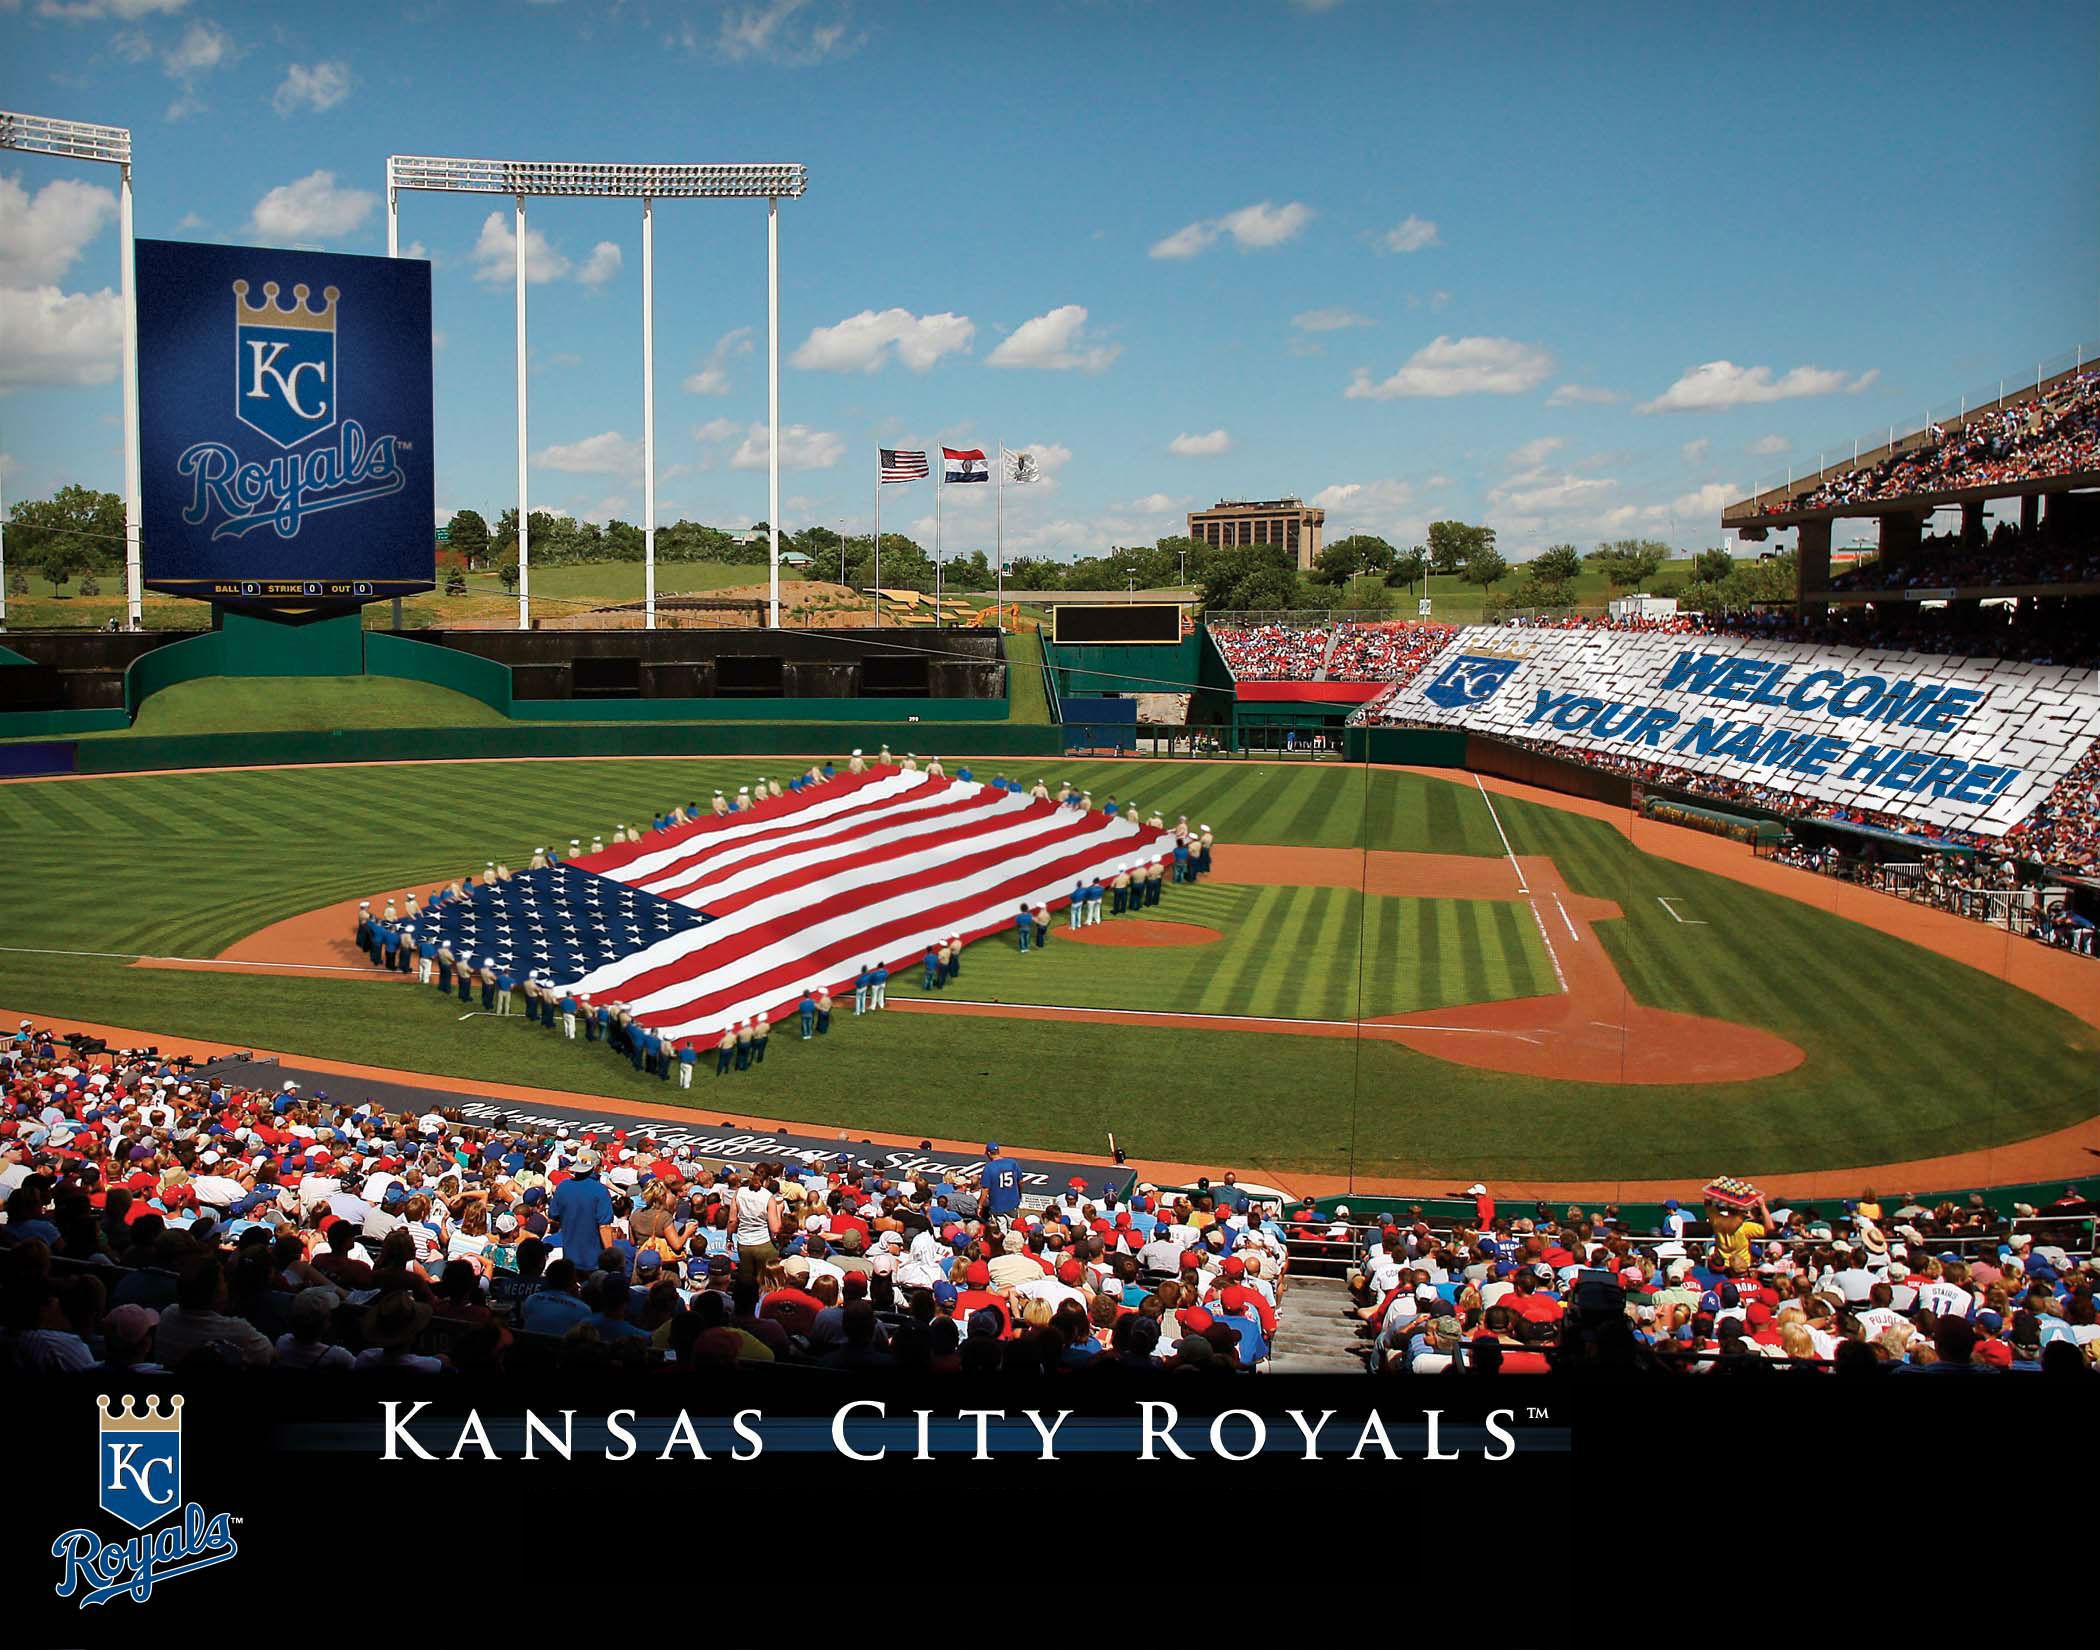 KANSAS CITY ROYALS mlb baseball 25 wallpaper background 2100x1650